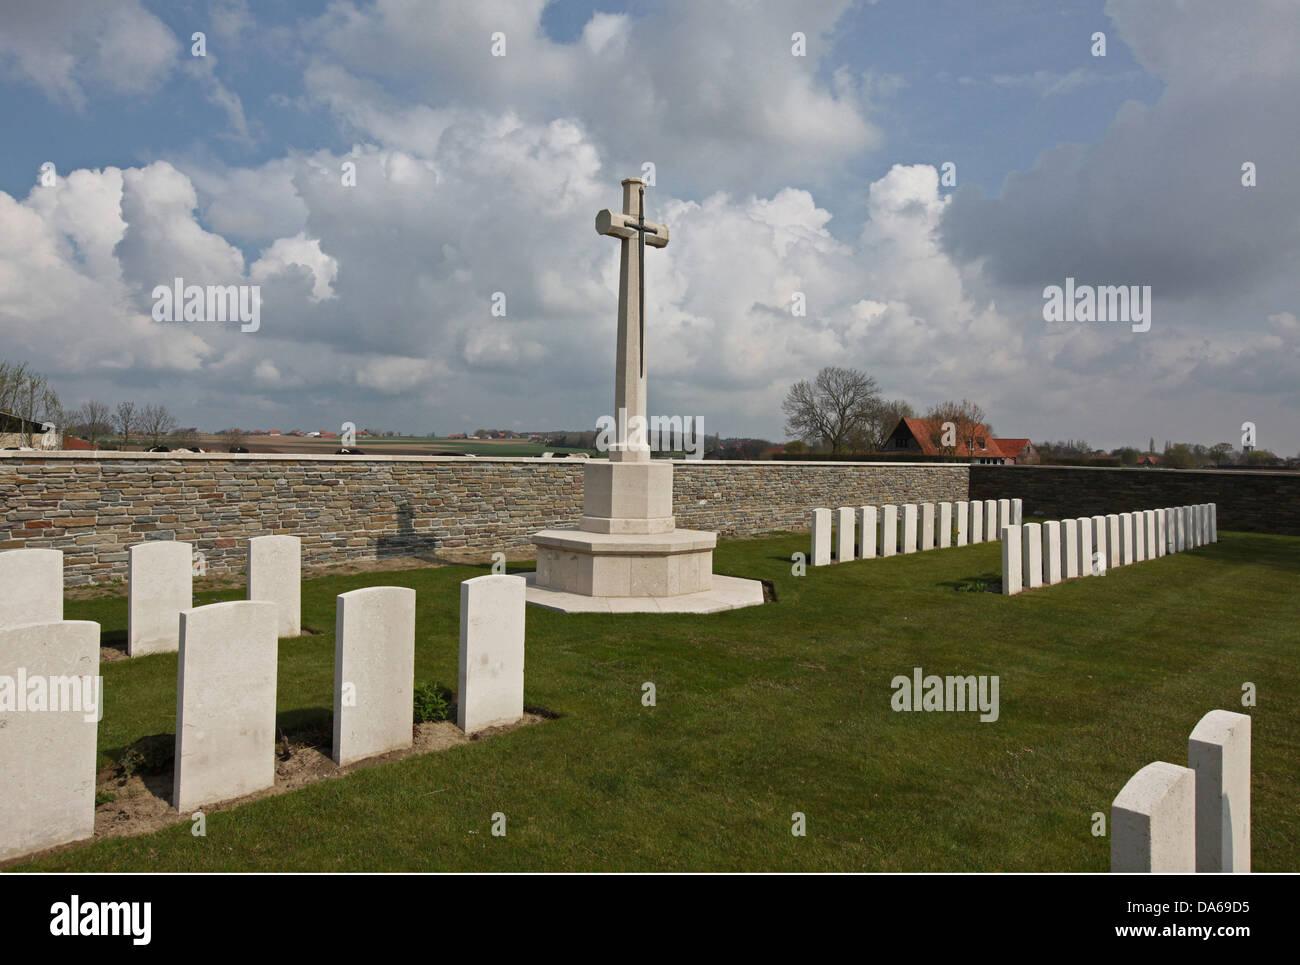 Abeele Aerodrome First World War Cemetery at Abeele in Belgium - Stock Image